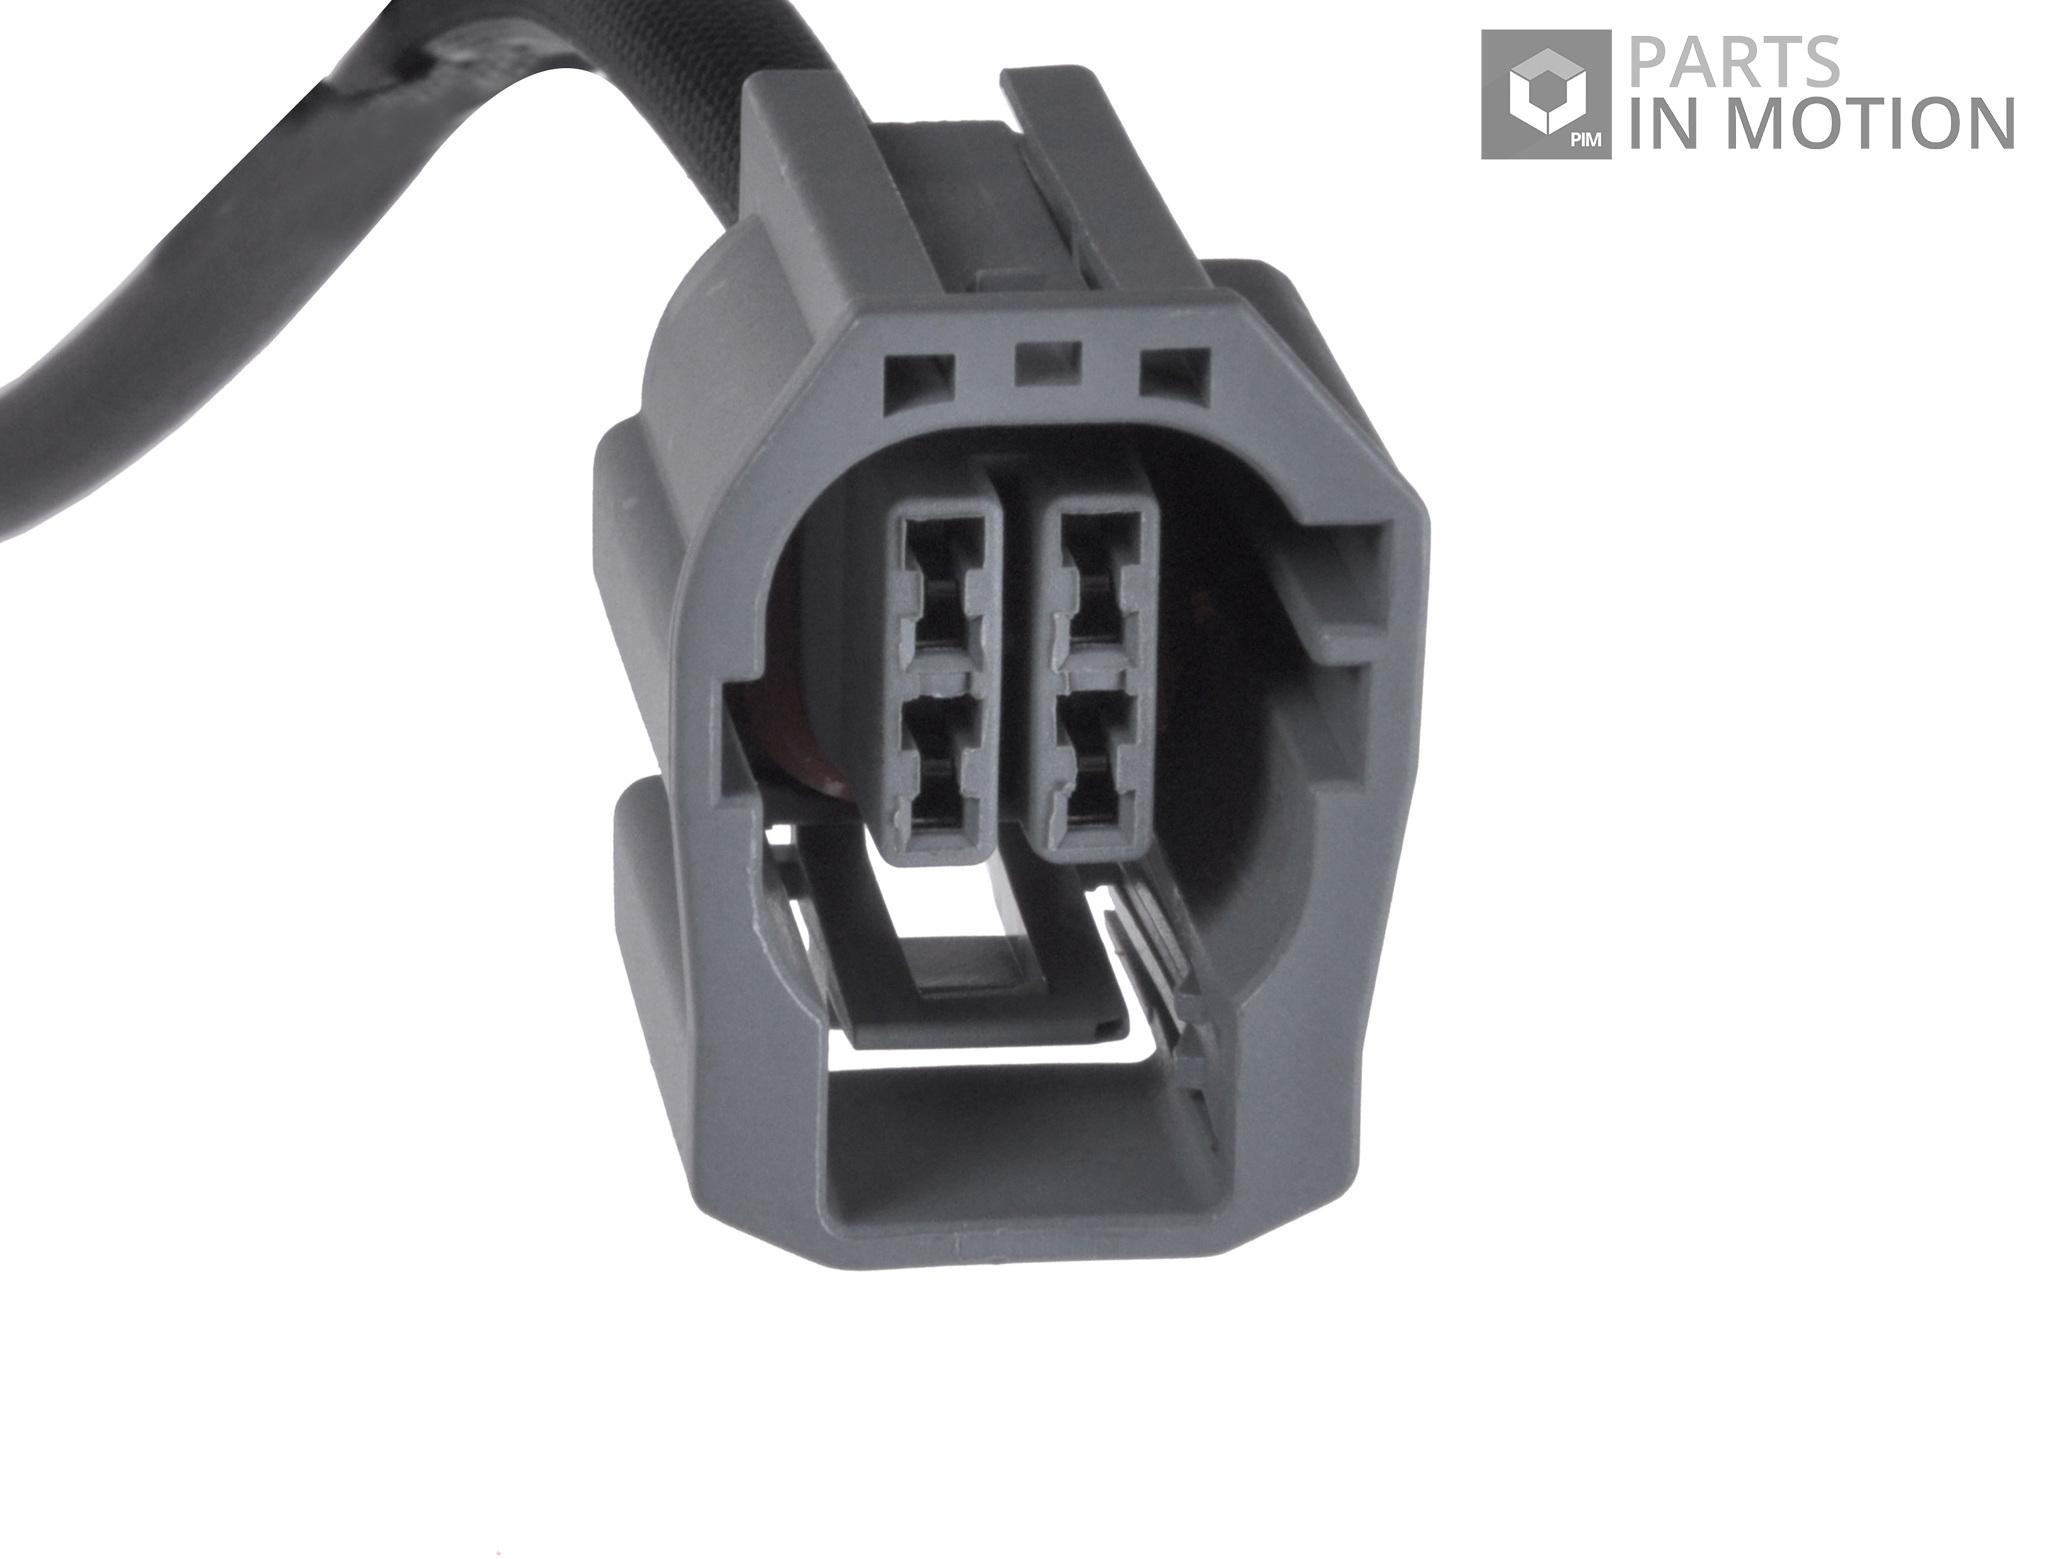 Lambda Sensor fits MAZDA 6 GH 2.2D 08 to 13 Oxygen ADL R2AA188G1 R2AA188G1A New